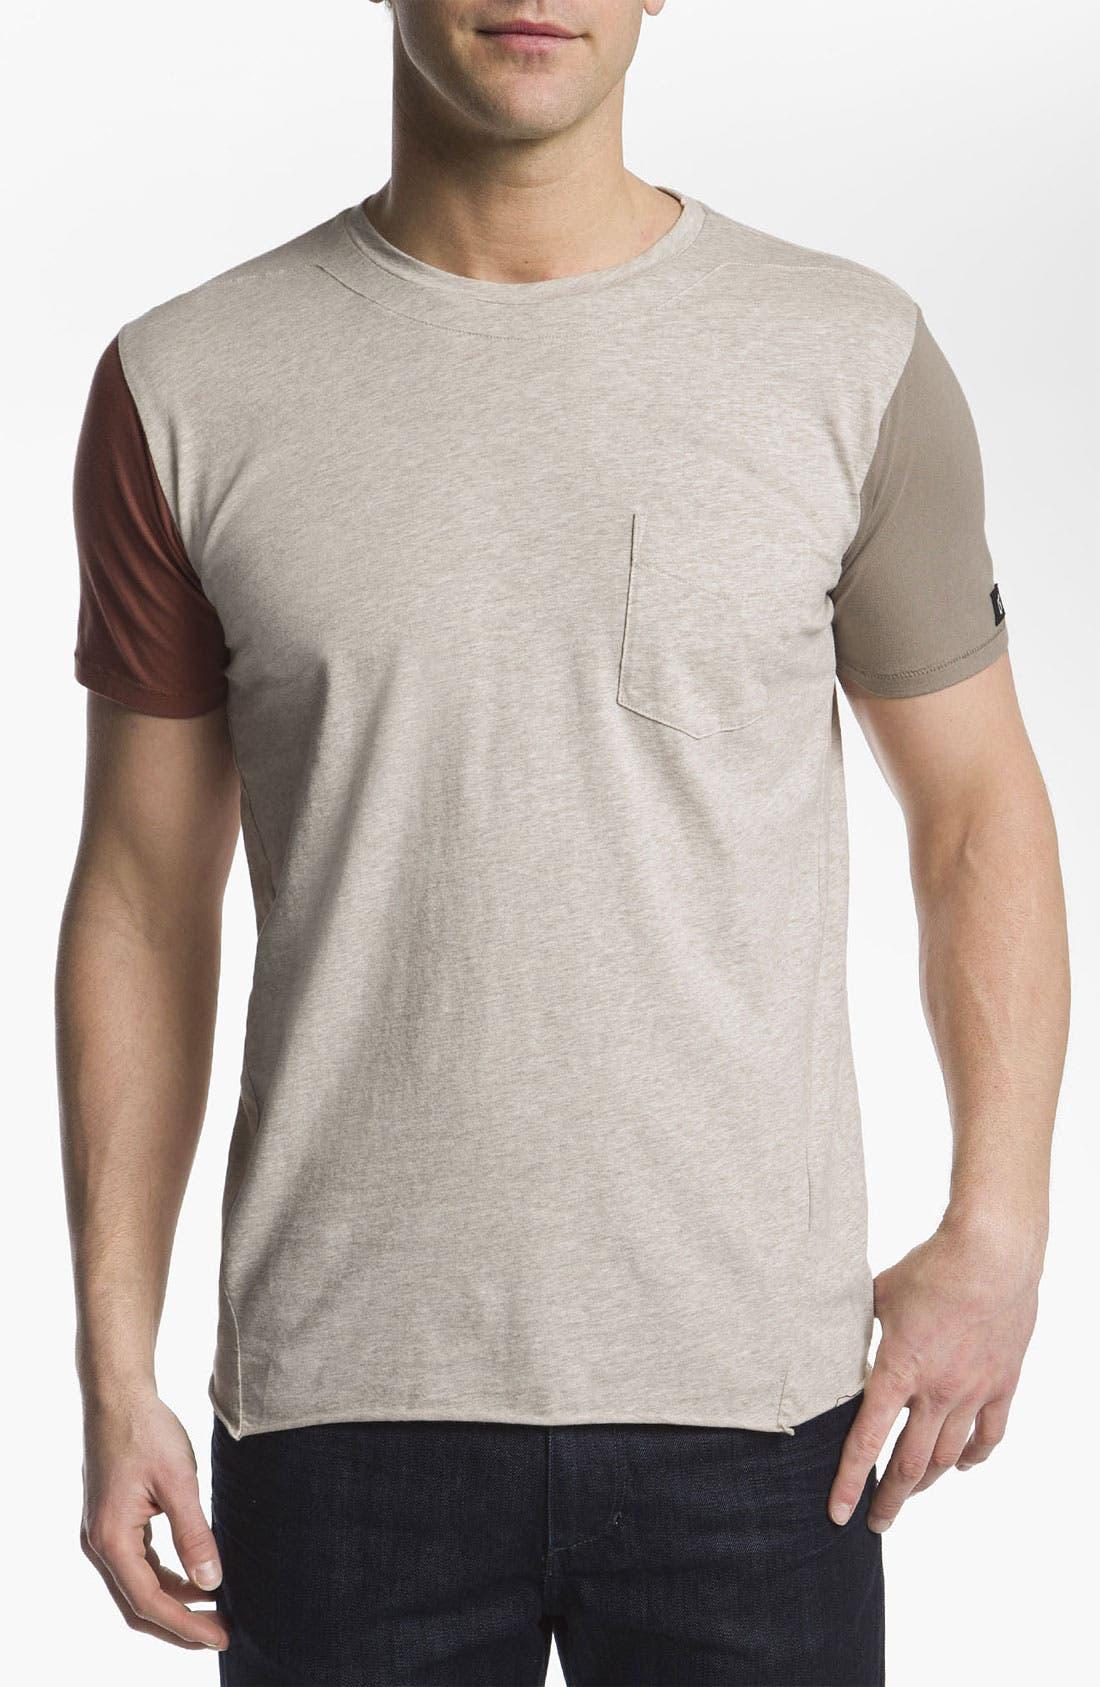 Alternate Image 1 Selected - Zanerobe 'Recon' T-Shirt